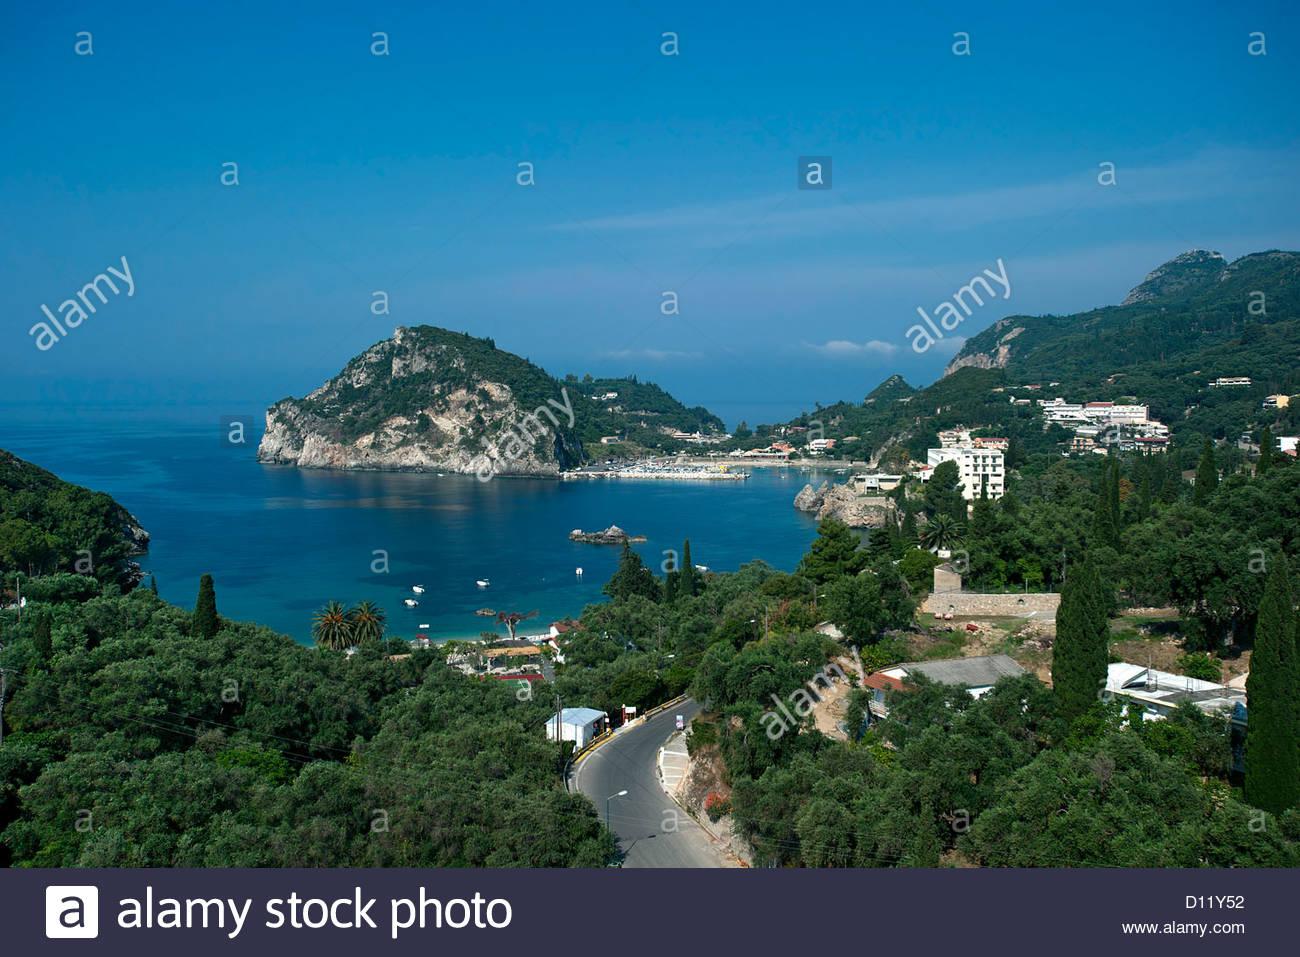 View of Paleokastritsa, Corfu, Ionian Islands, Greece - Stock Image